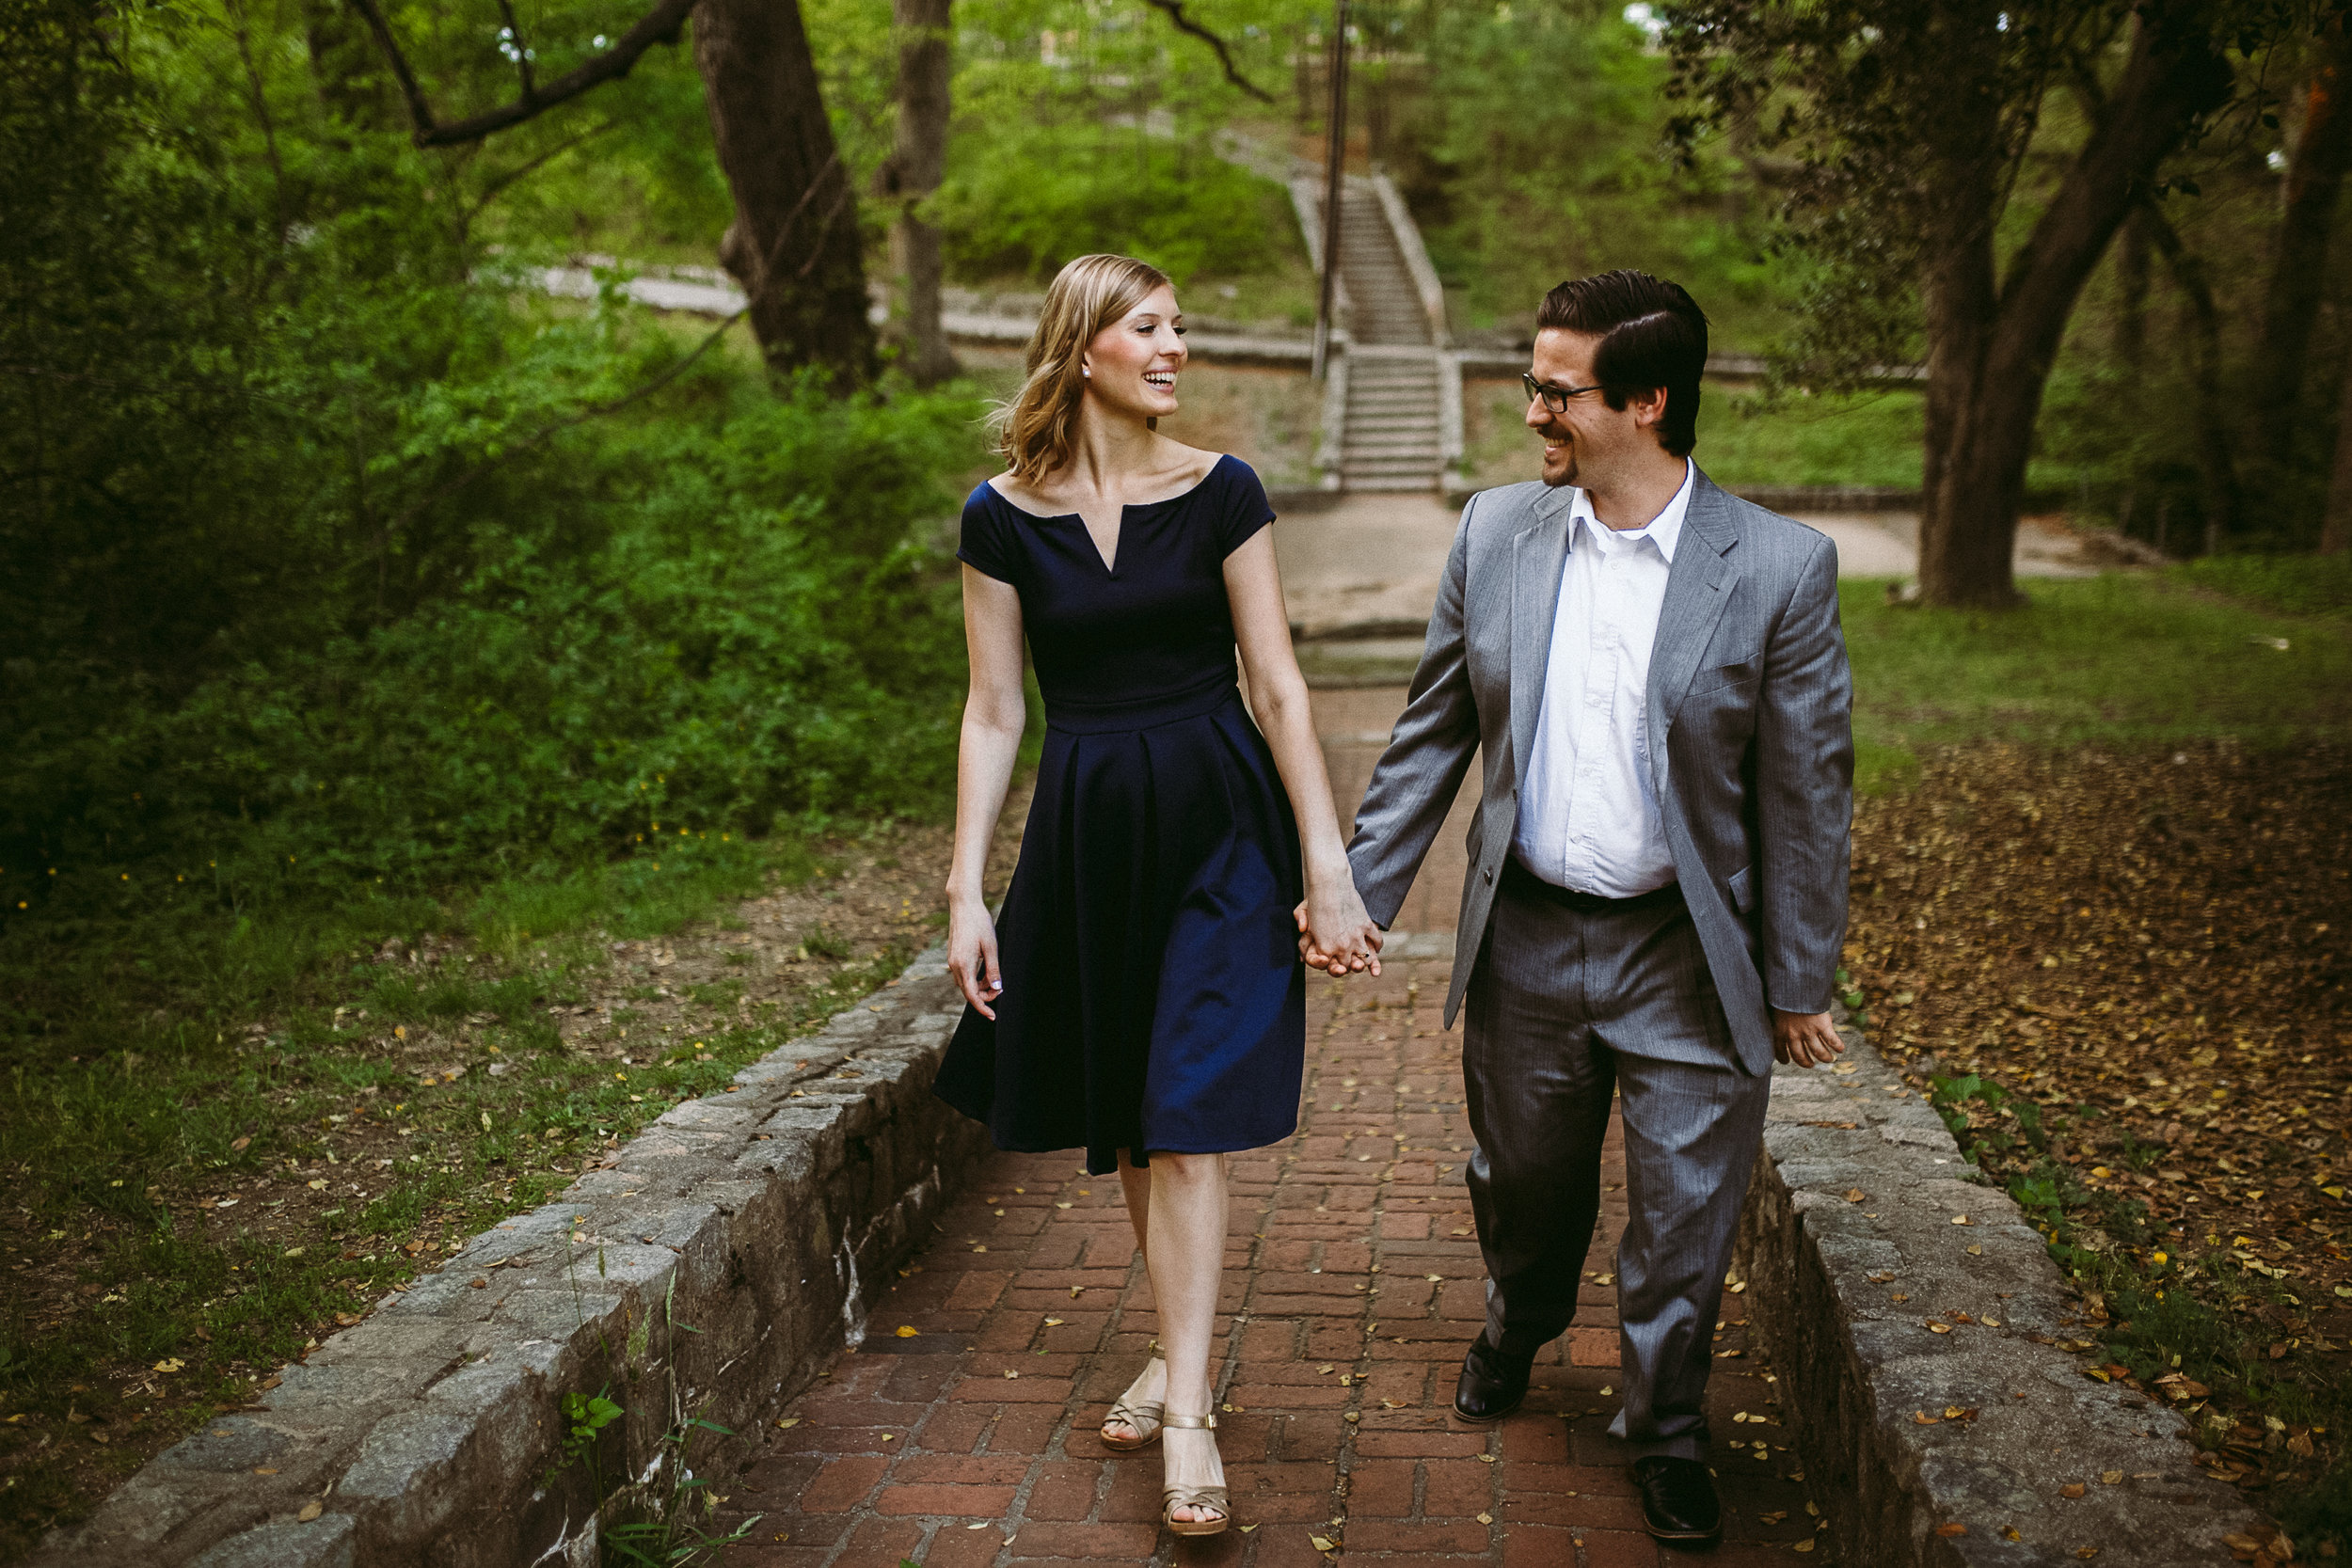 Stephanieandtommyjoe.richmondvirginia.foresthillpark.engagementsession.rebeccaburtphotography-65.jpg